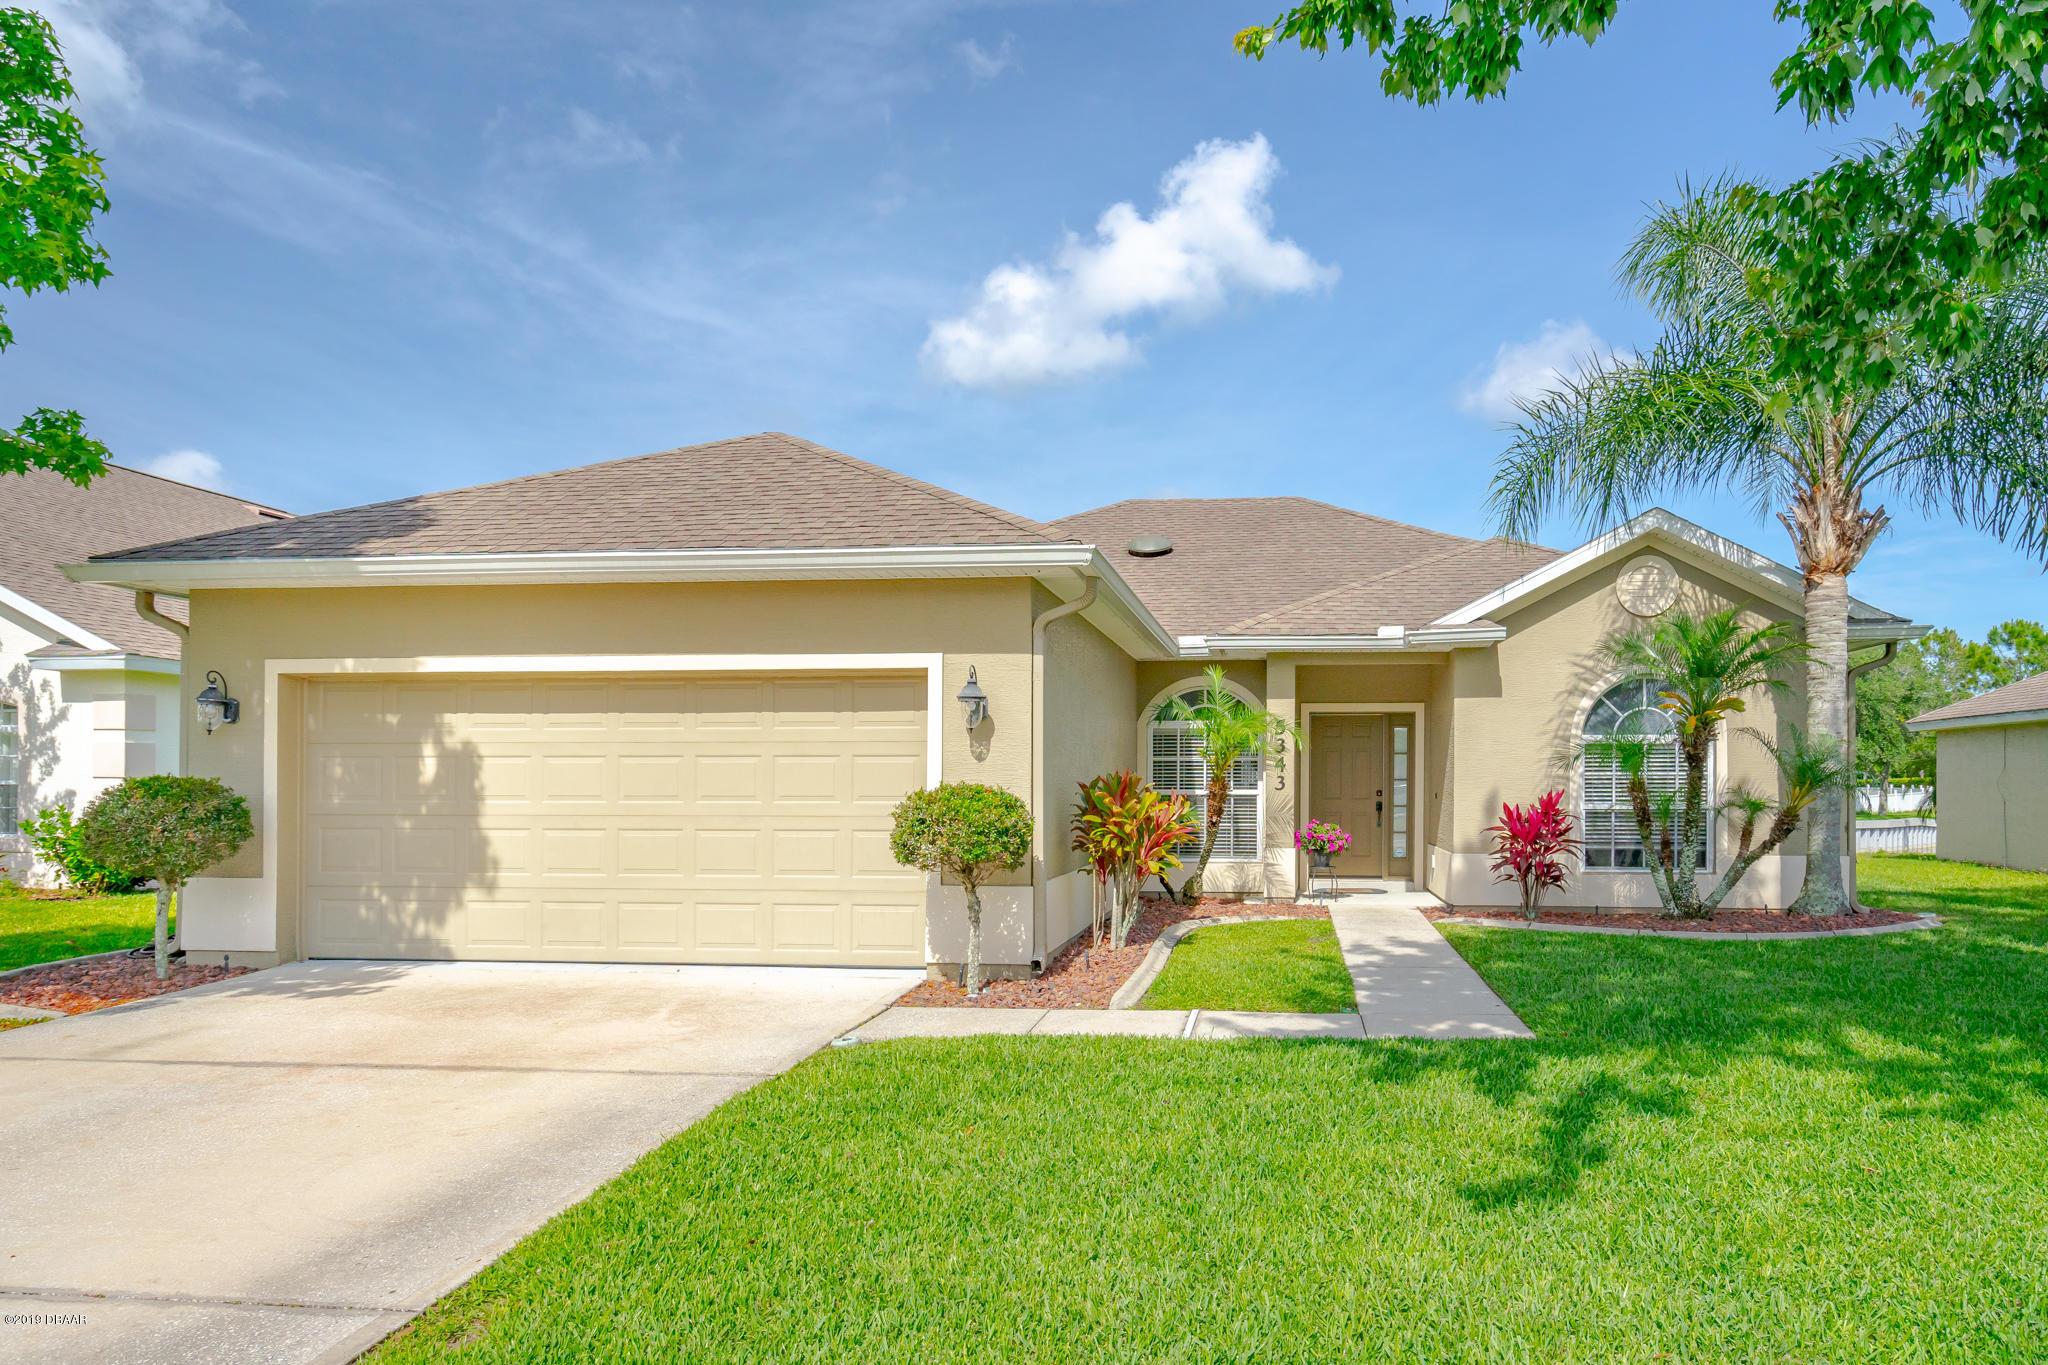 Photo of 5343 Plantation Home Way, Port Orange, FL 32128